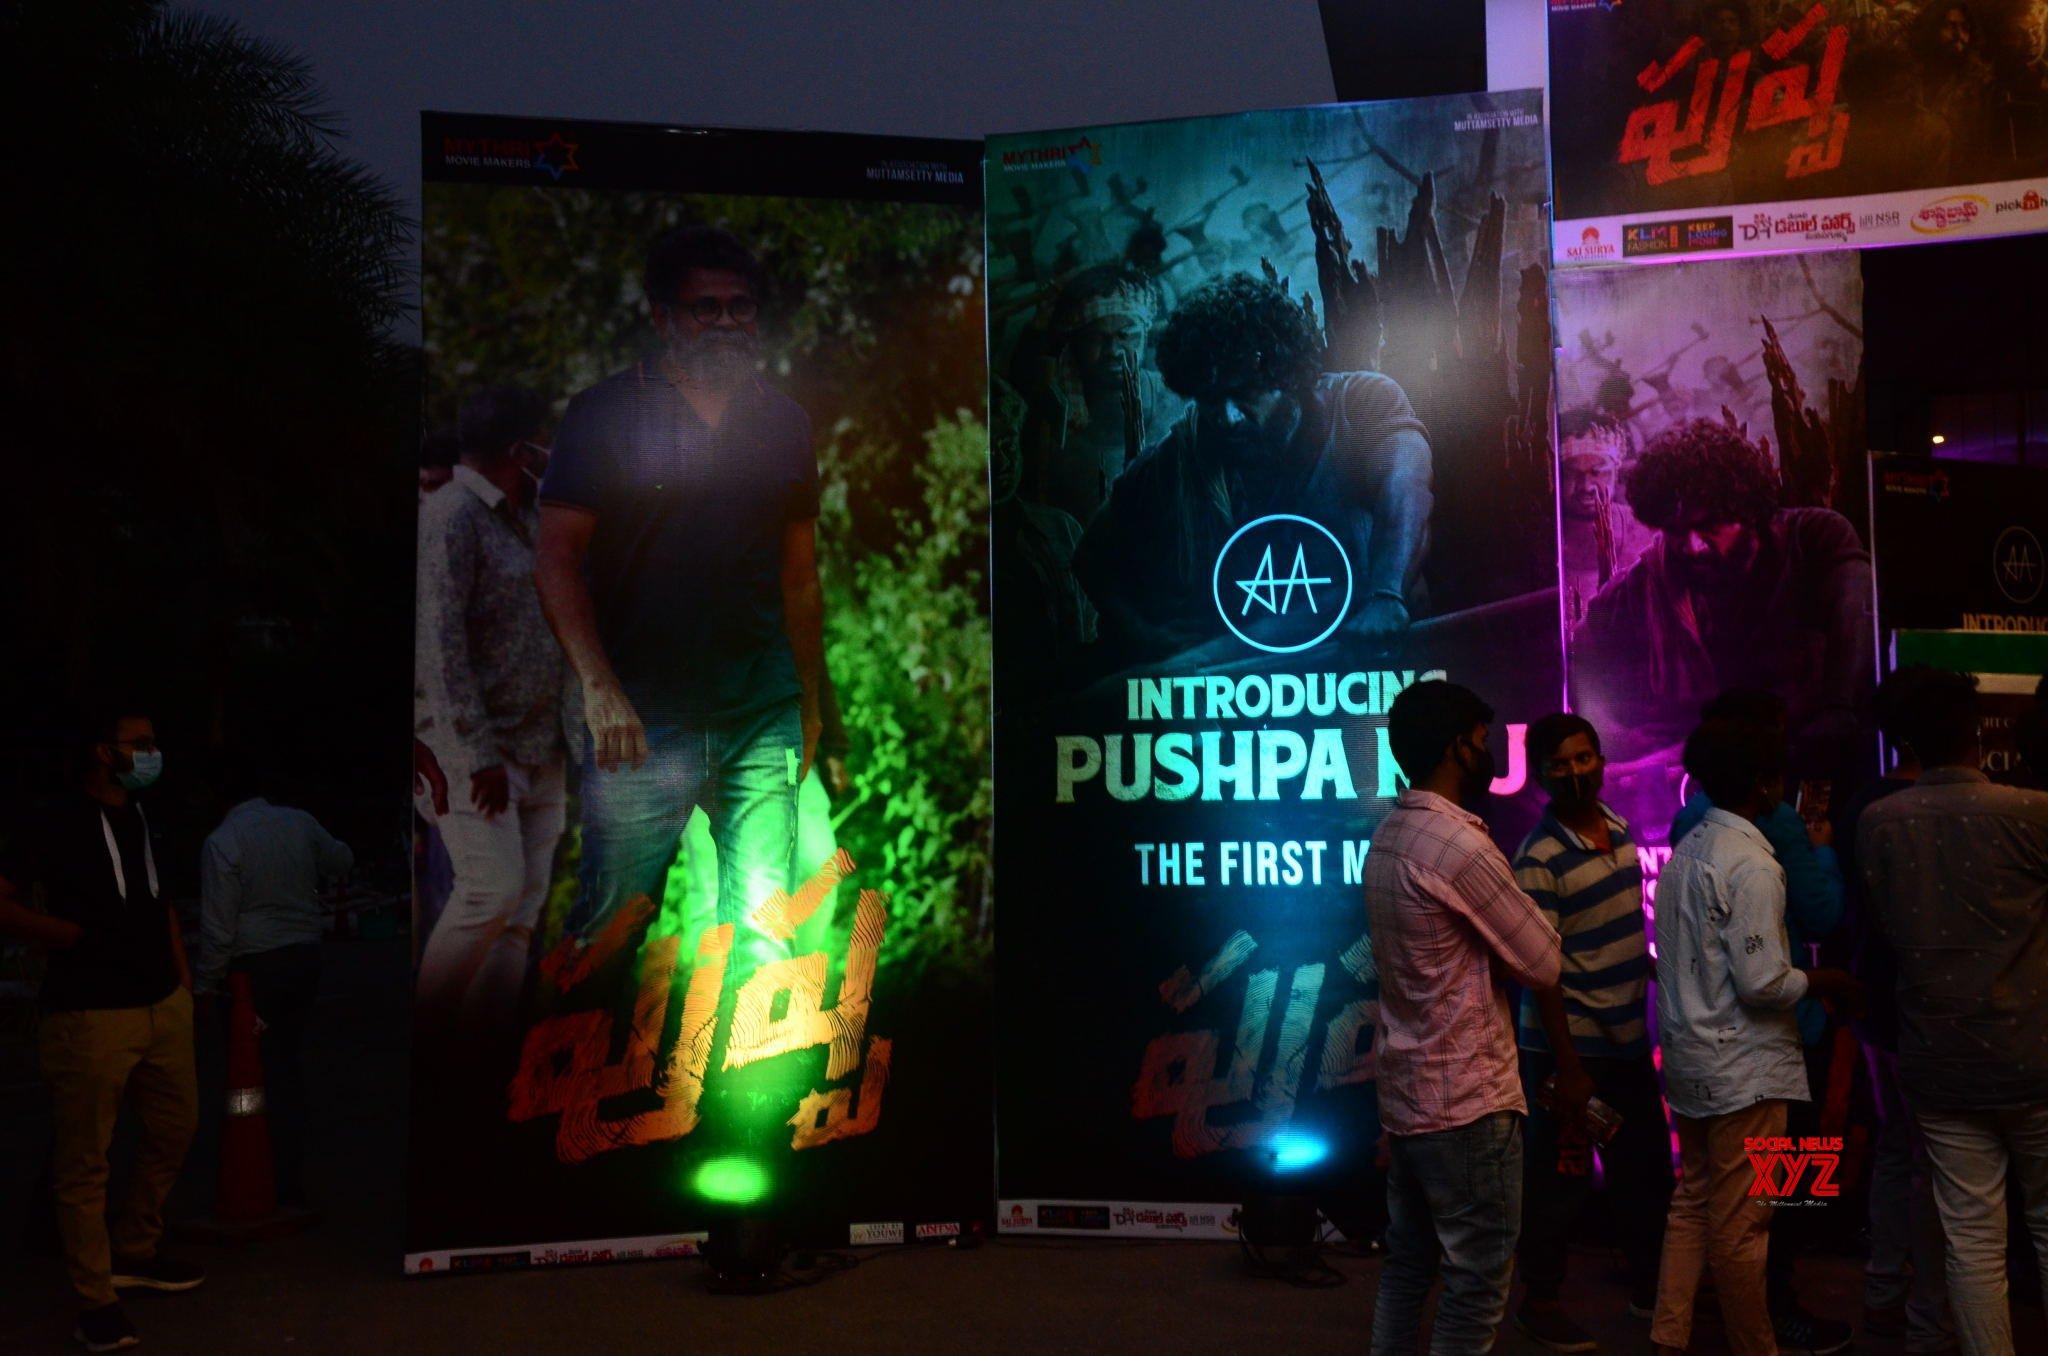 Allu Arjun's Pushpa Movie Introducing Pushpa Raj The First Meet Event Gallery Set 1